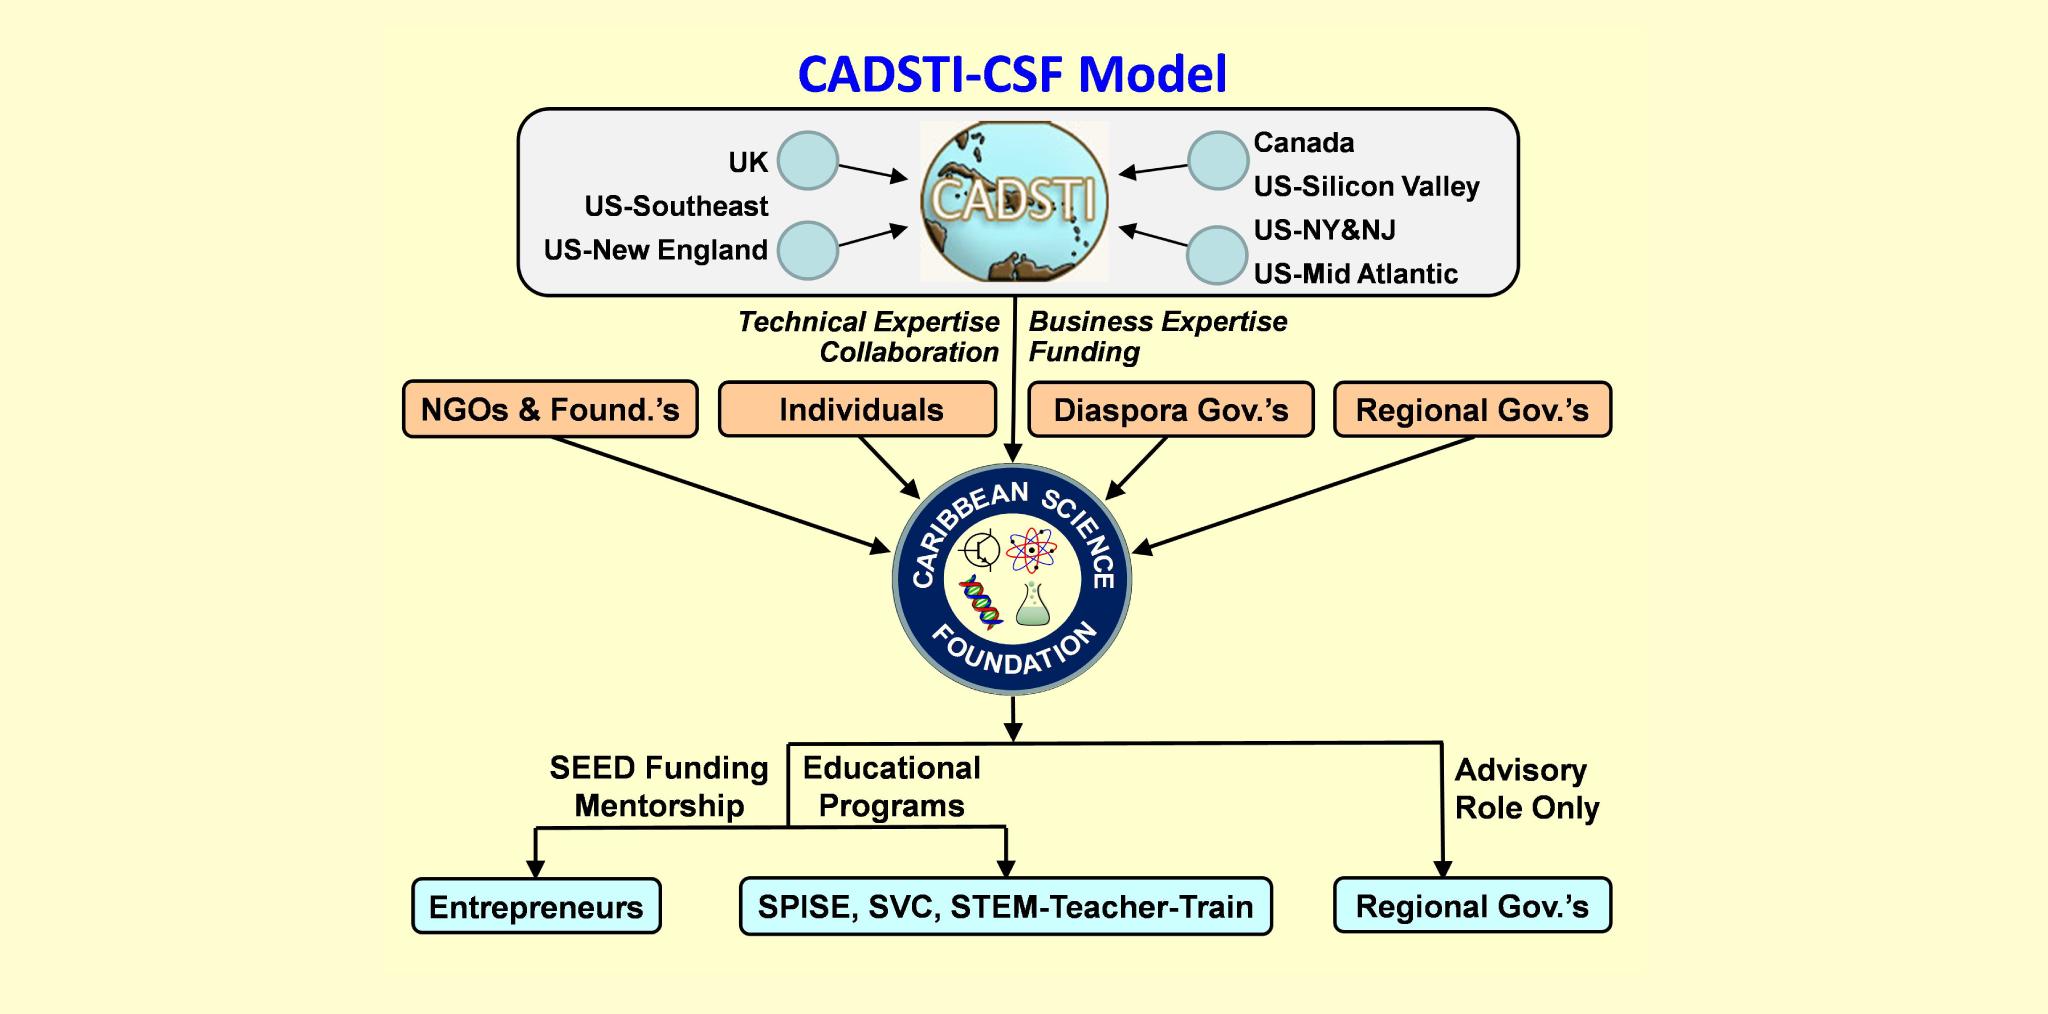 World Bank Study Supports CADSTI-CSF Model